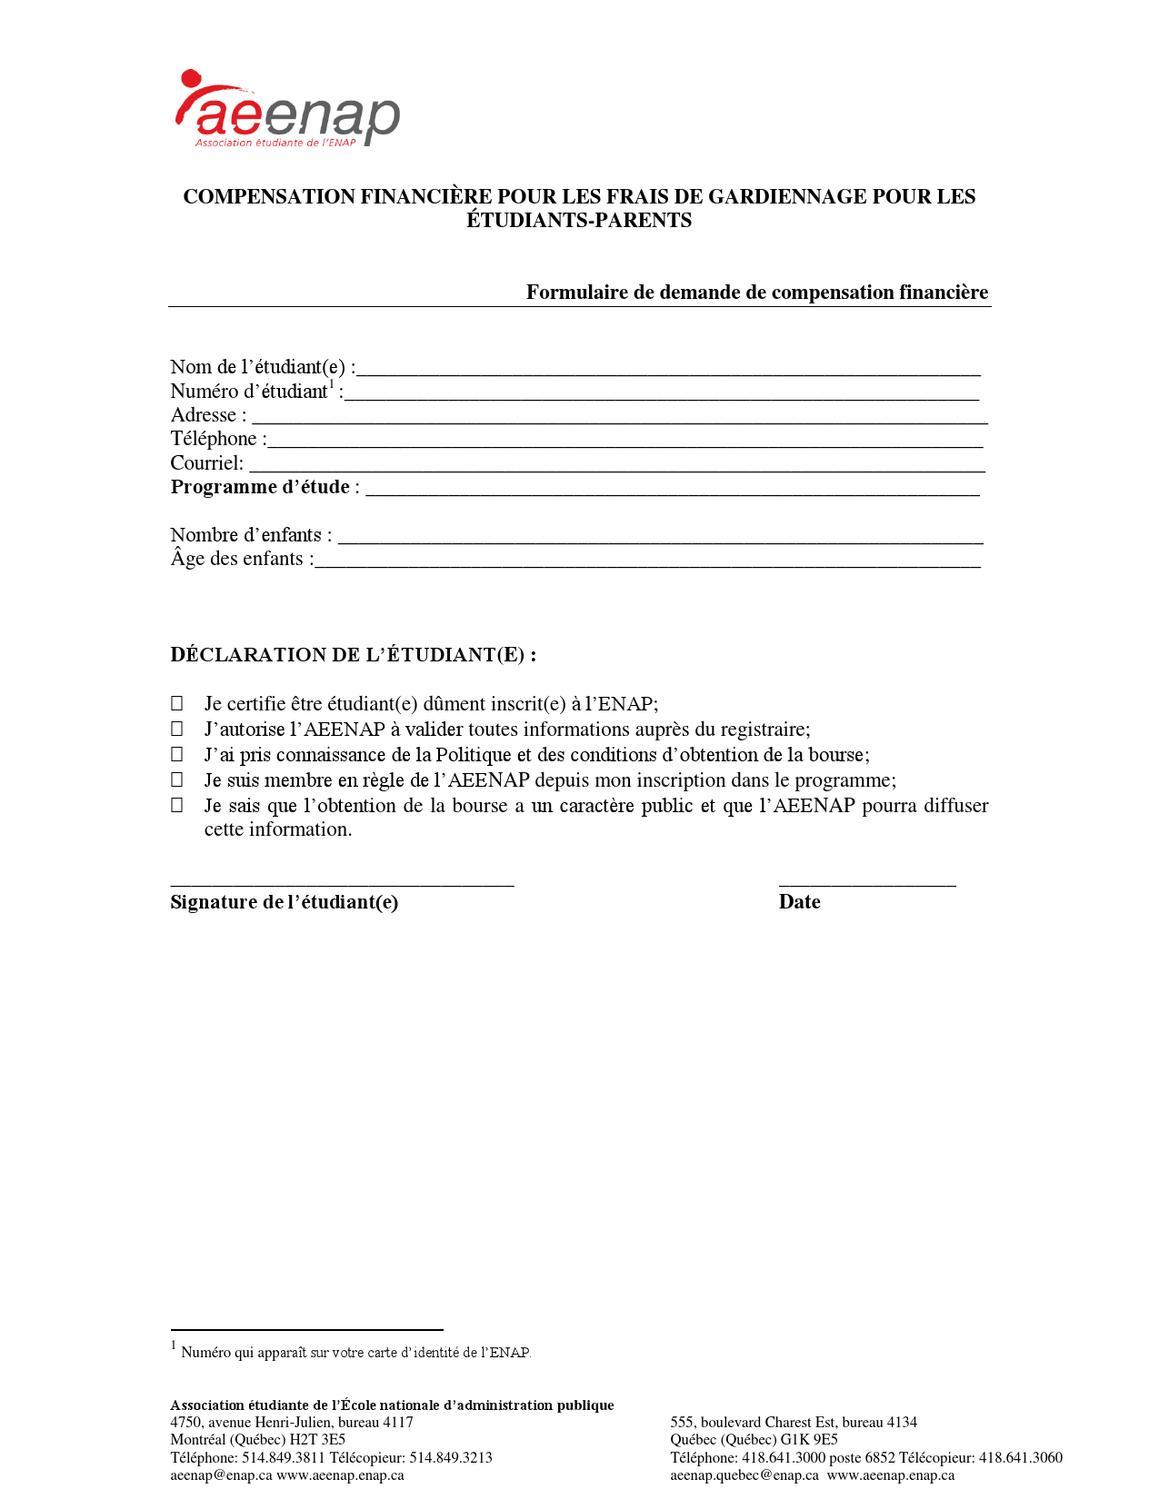 formulaire compensation financi re pour tudiants parents by asso aeena p issuu. Black Bedroom Furniture Sets. Home Design Ideas